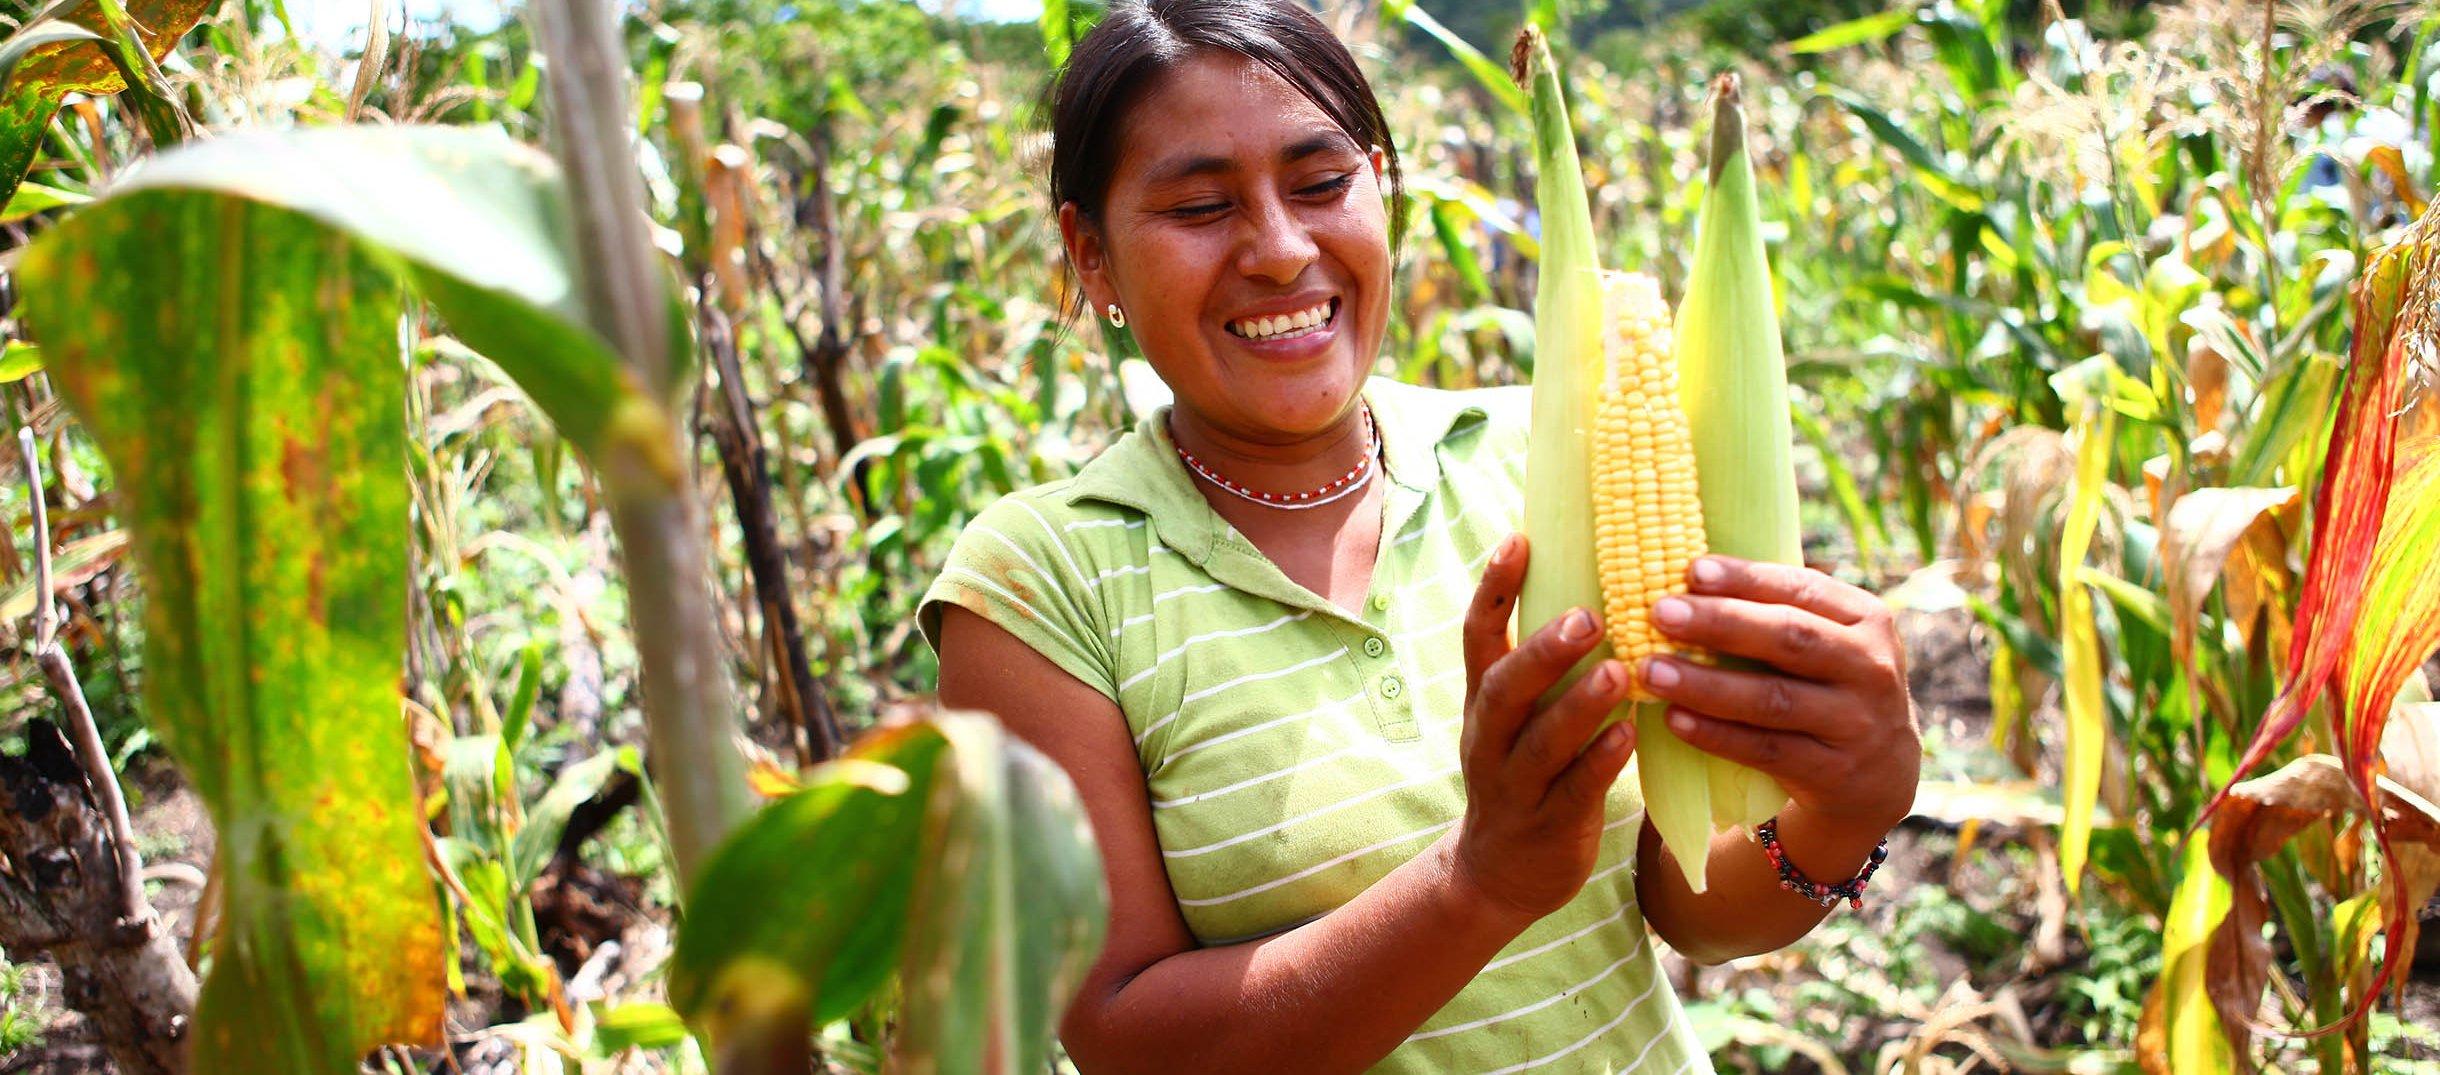 women-led-traditional-garden-amazon-climate-change-OUS_47054.jpg